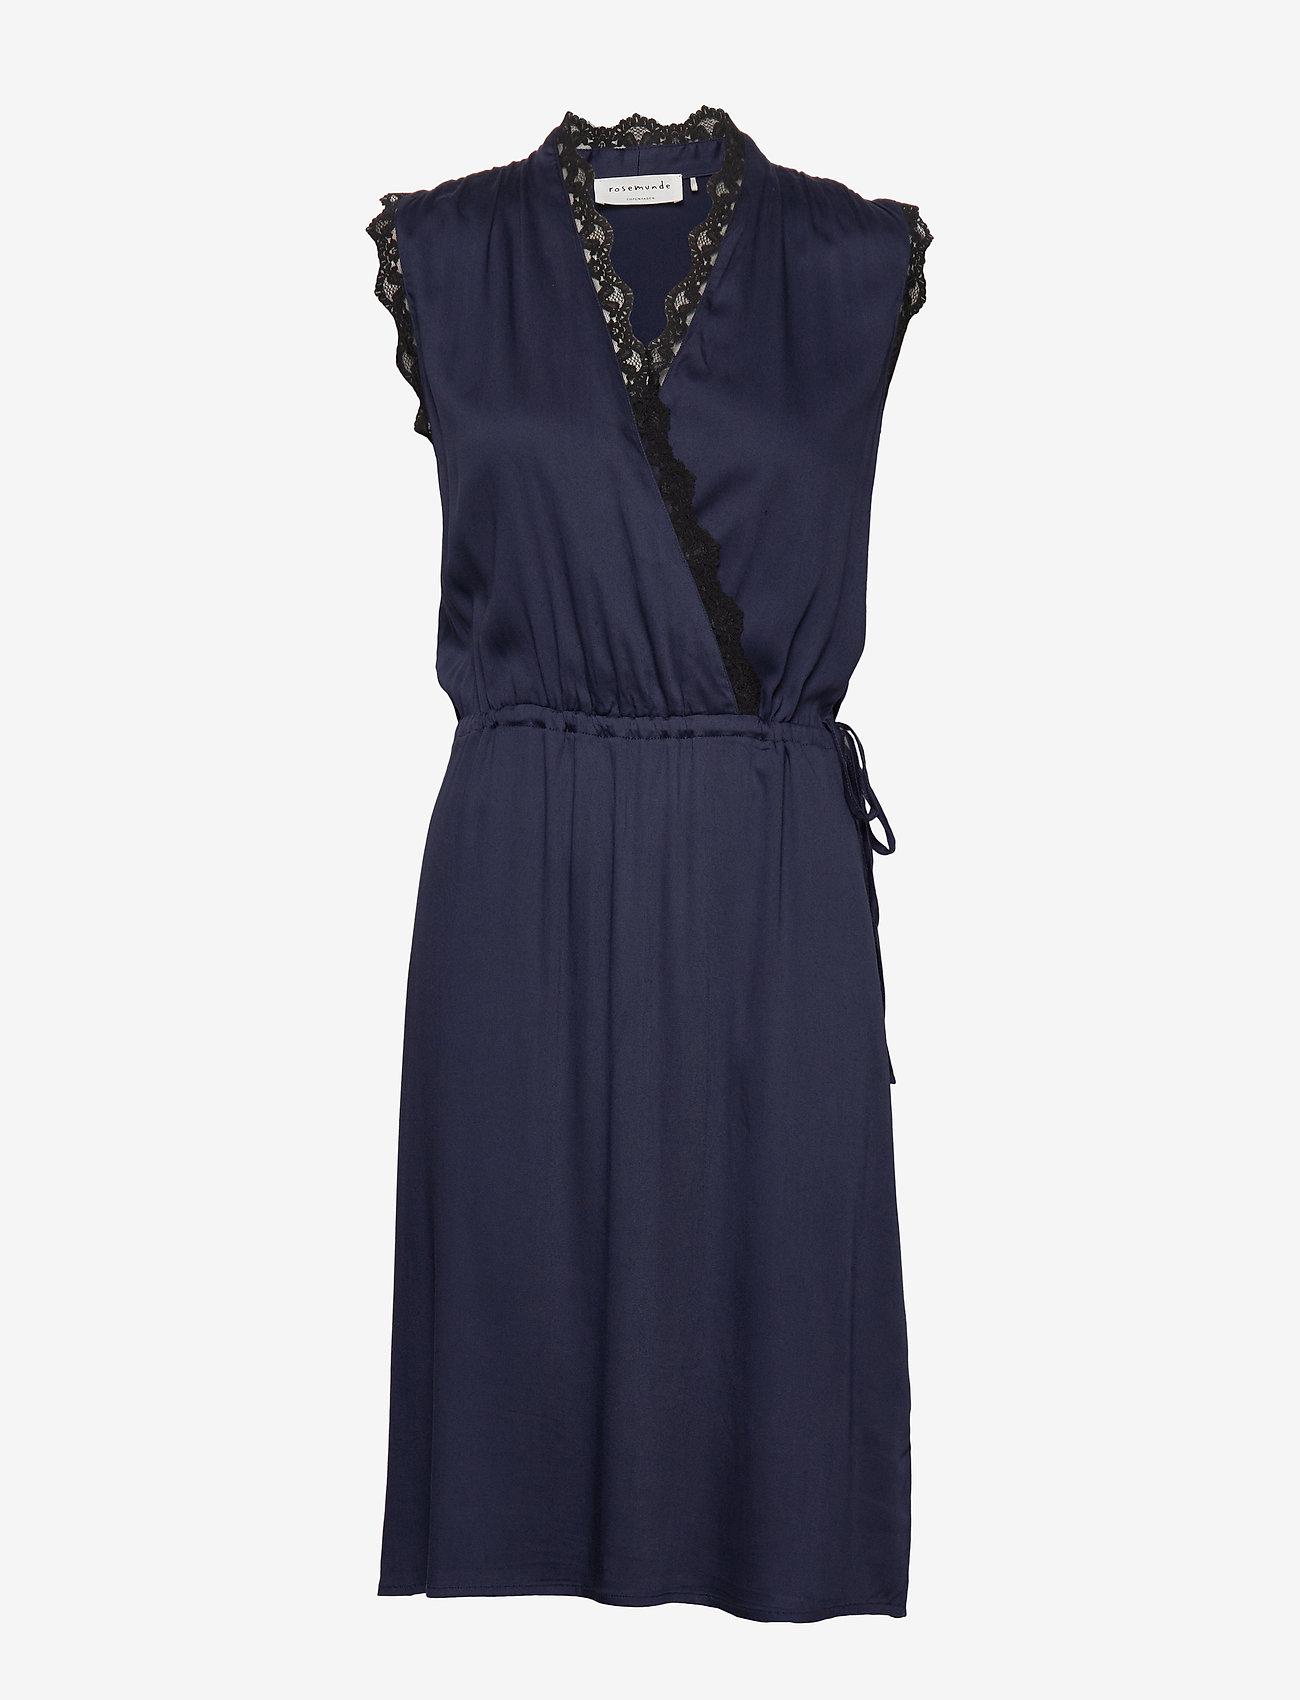 Rosemunde - Dress - robes portefeuille - navy - 0